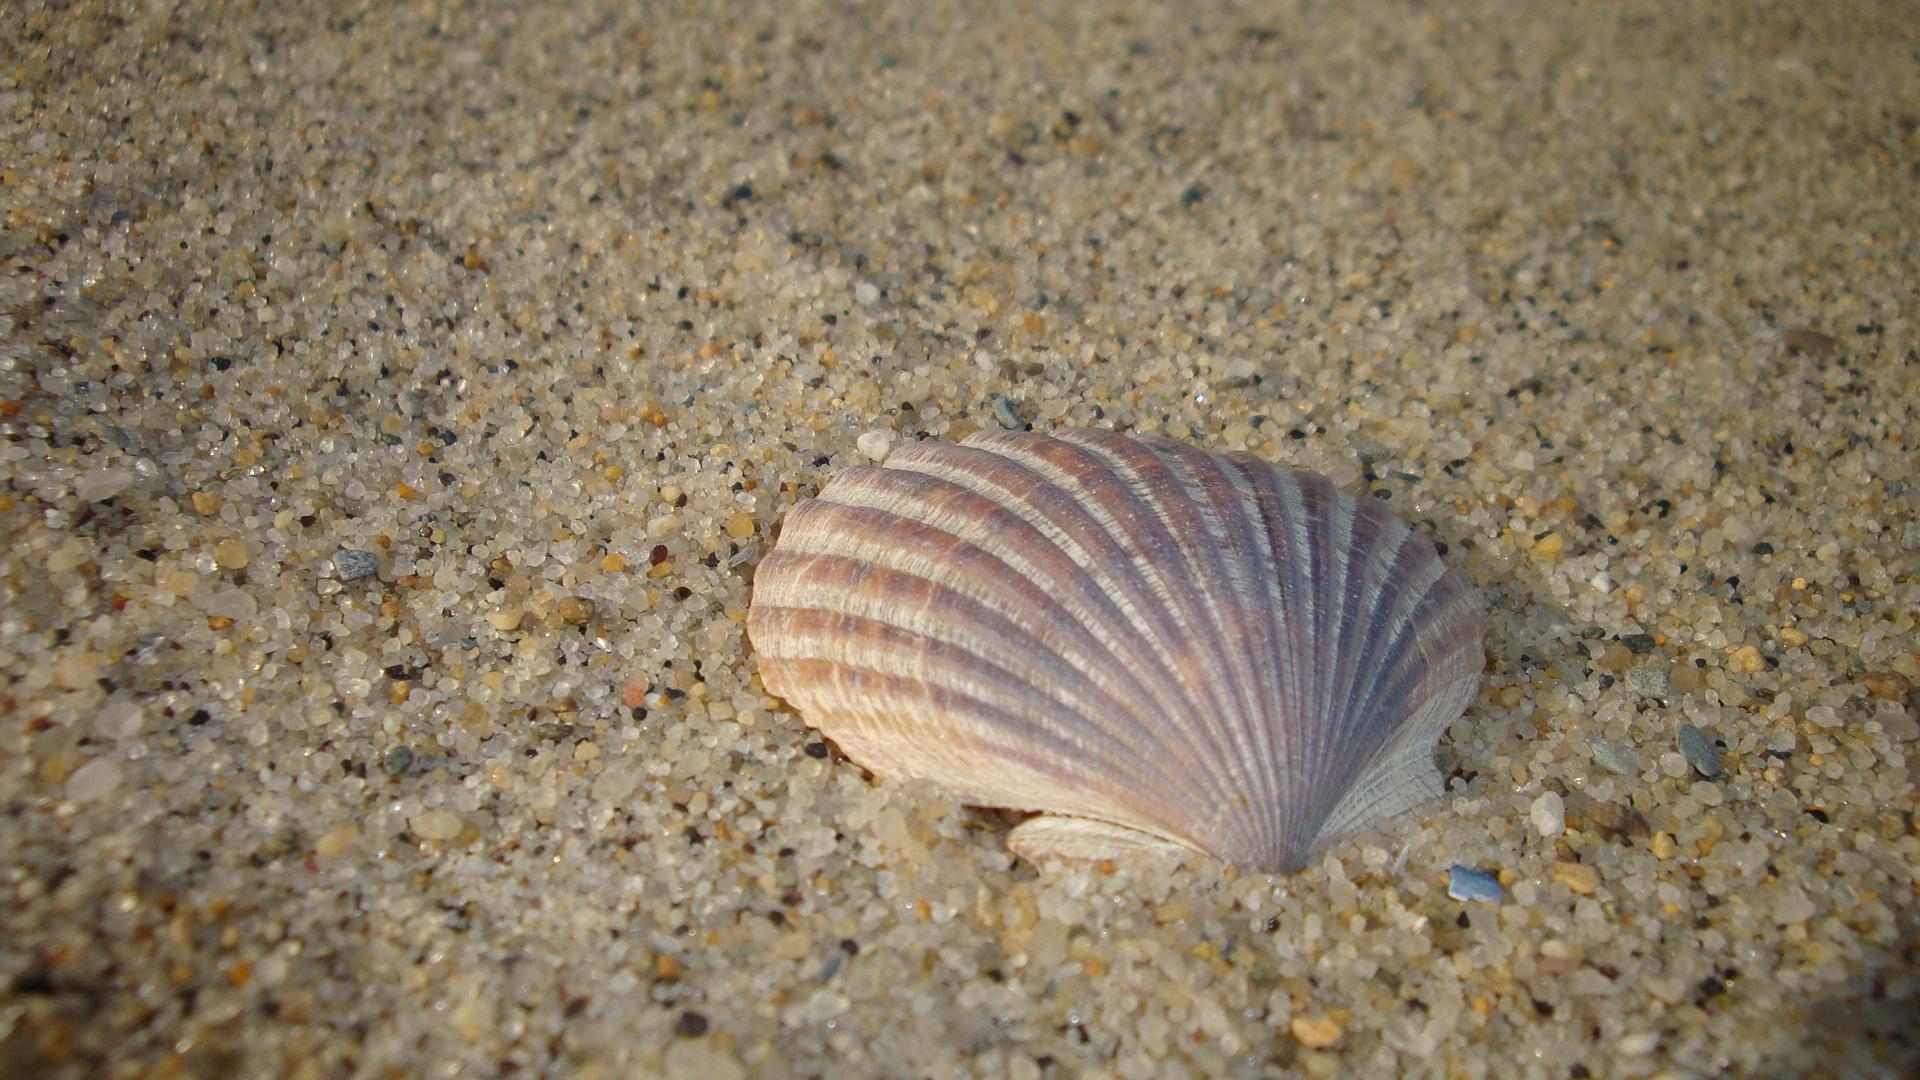 Artistic shot of seashell